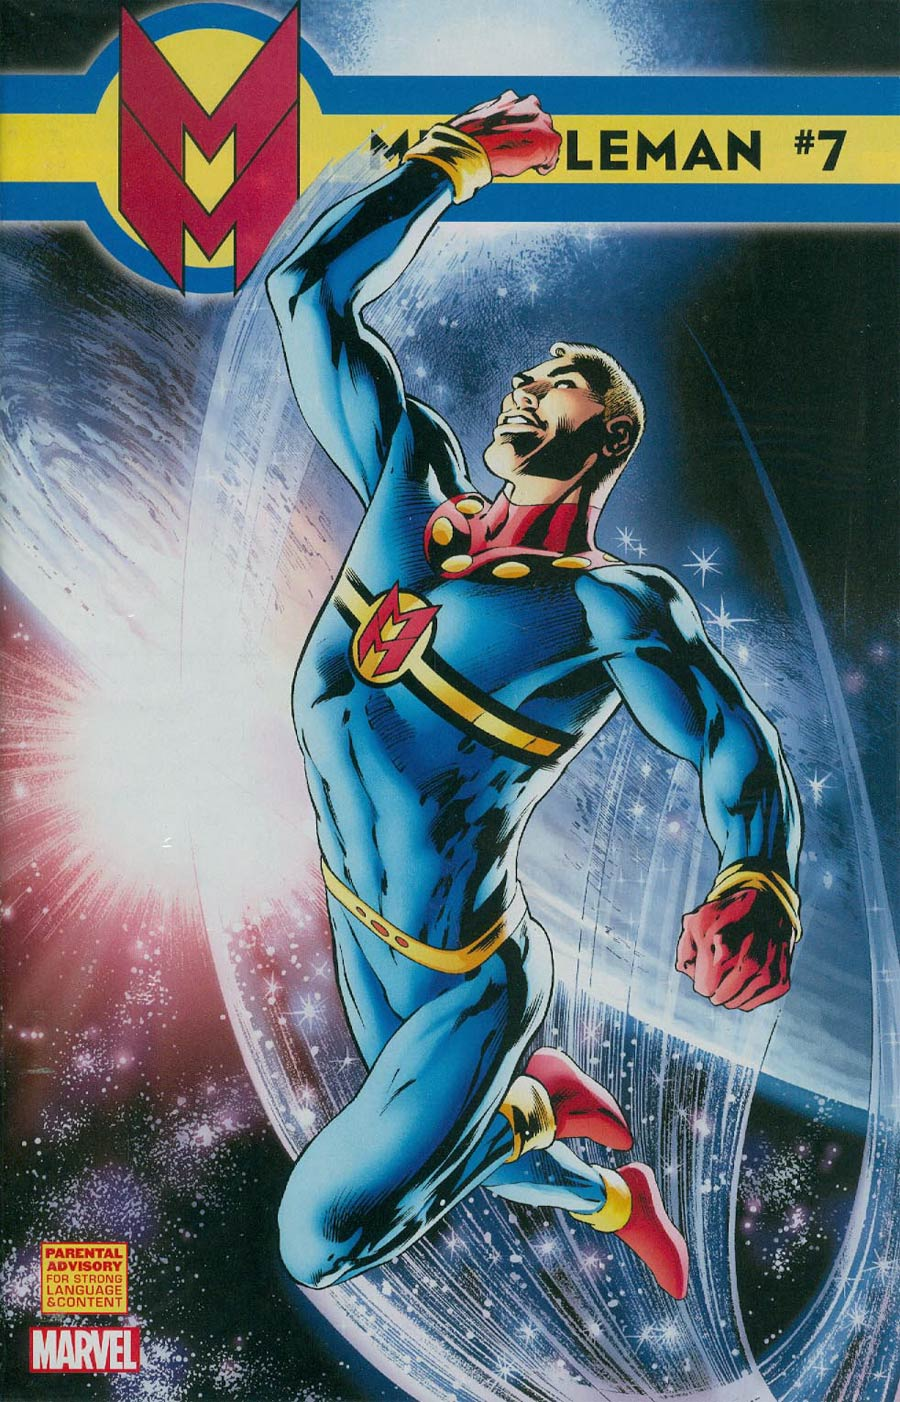 Miracleman (Marvel) #7 Cover A Regular Alan Davis Cover With Polybag